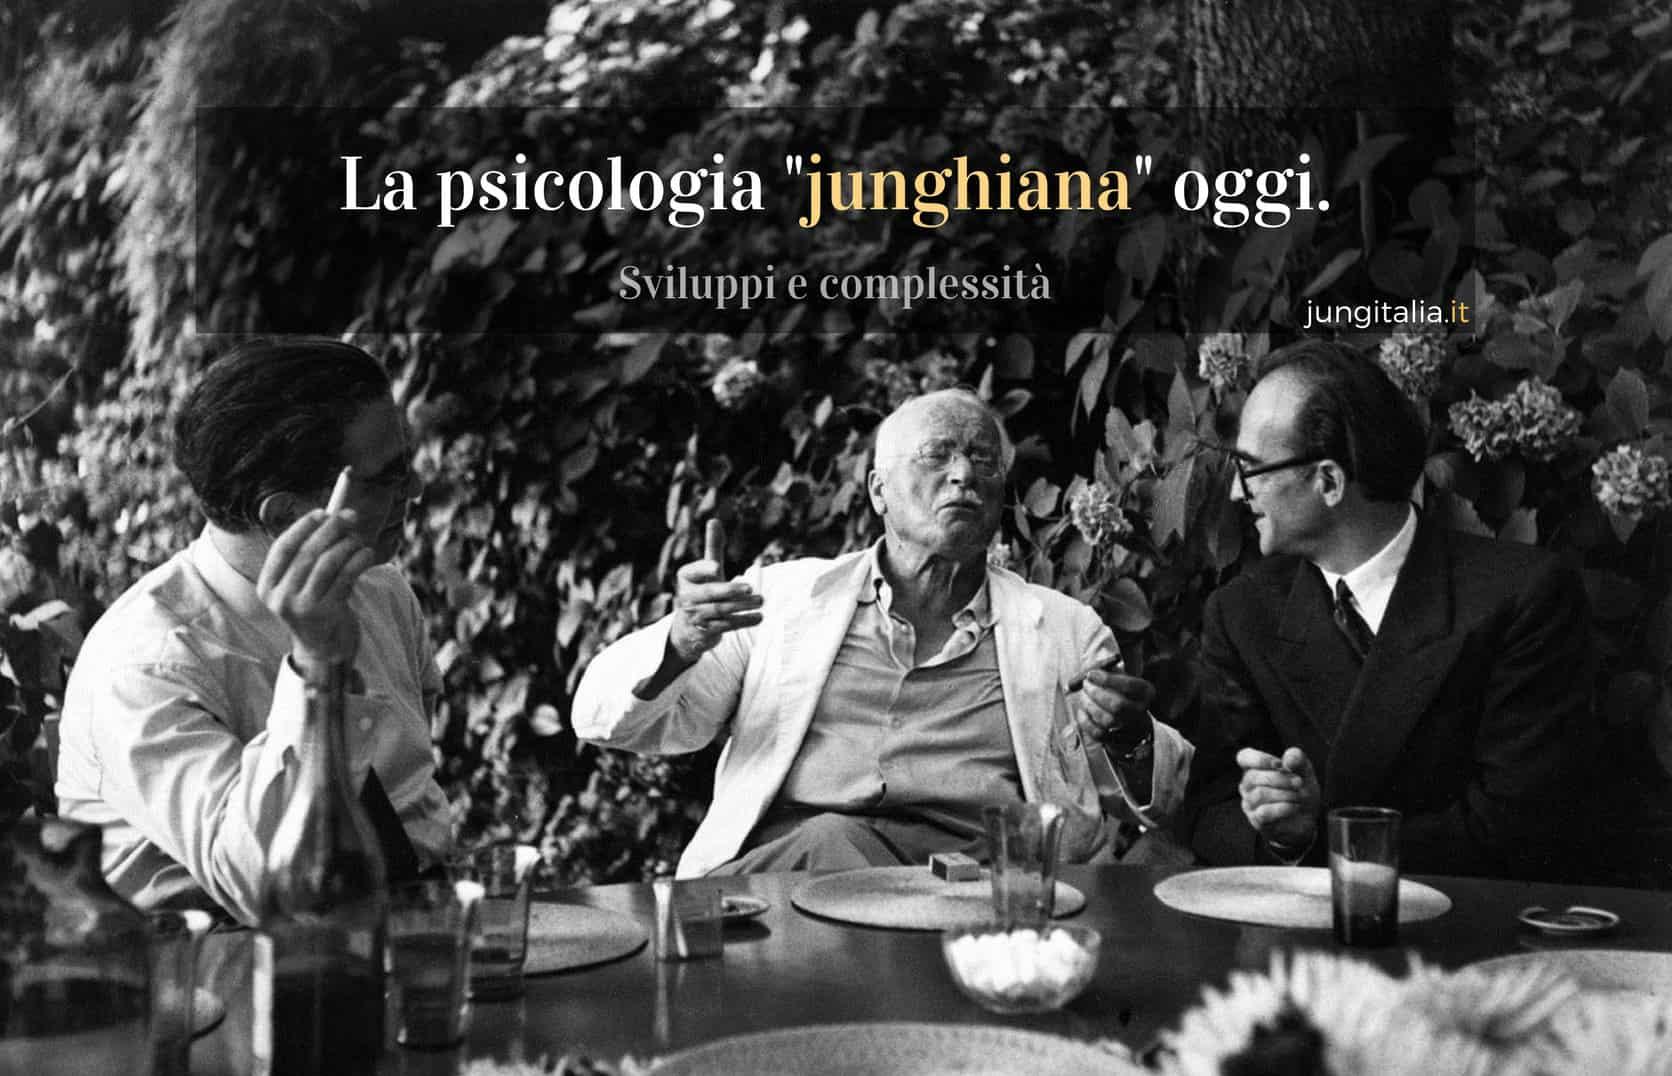 psicologia junghiana oggi sviluppi